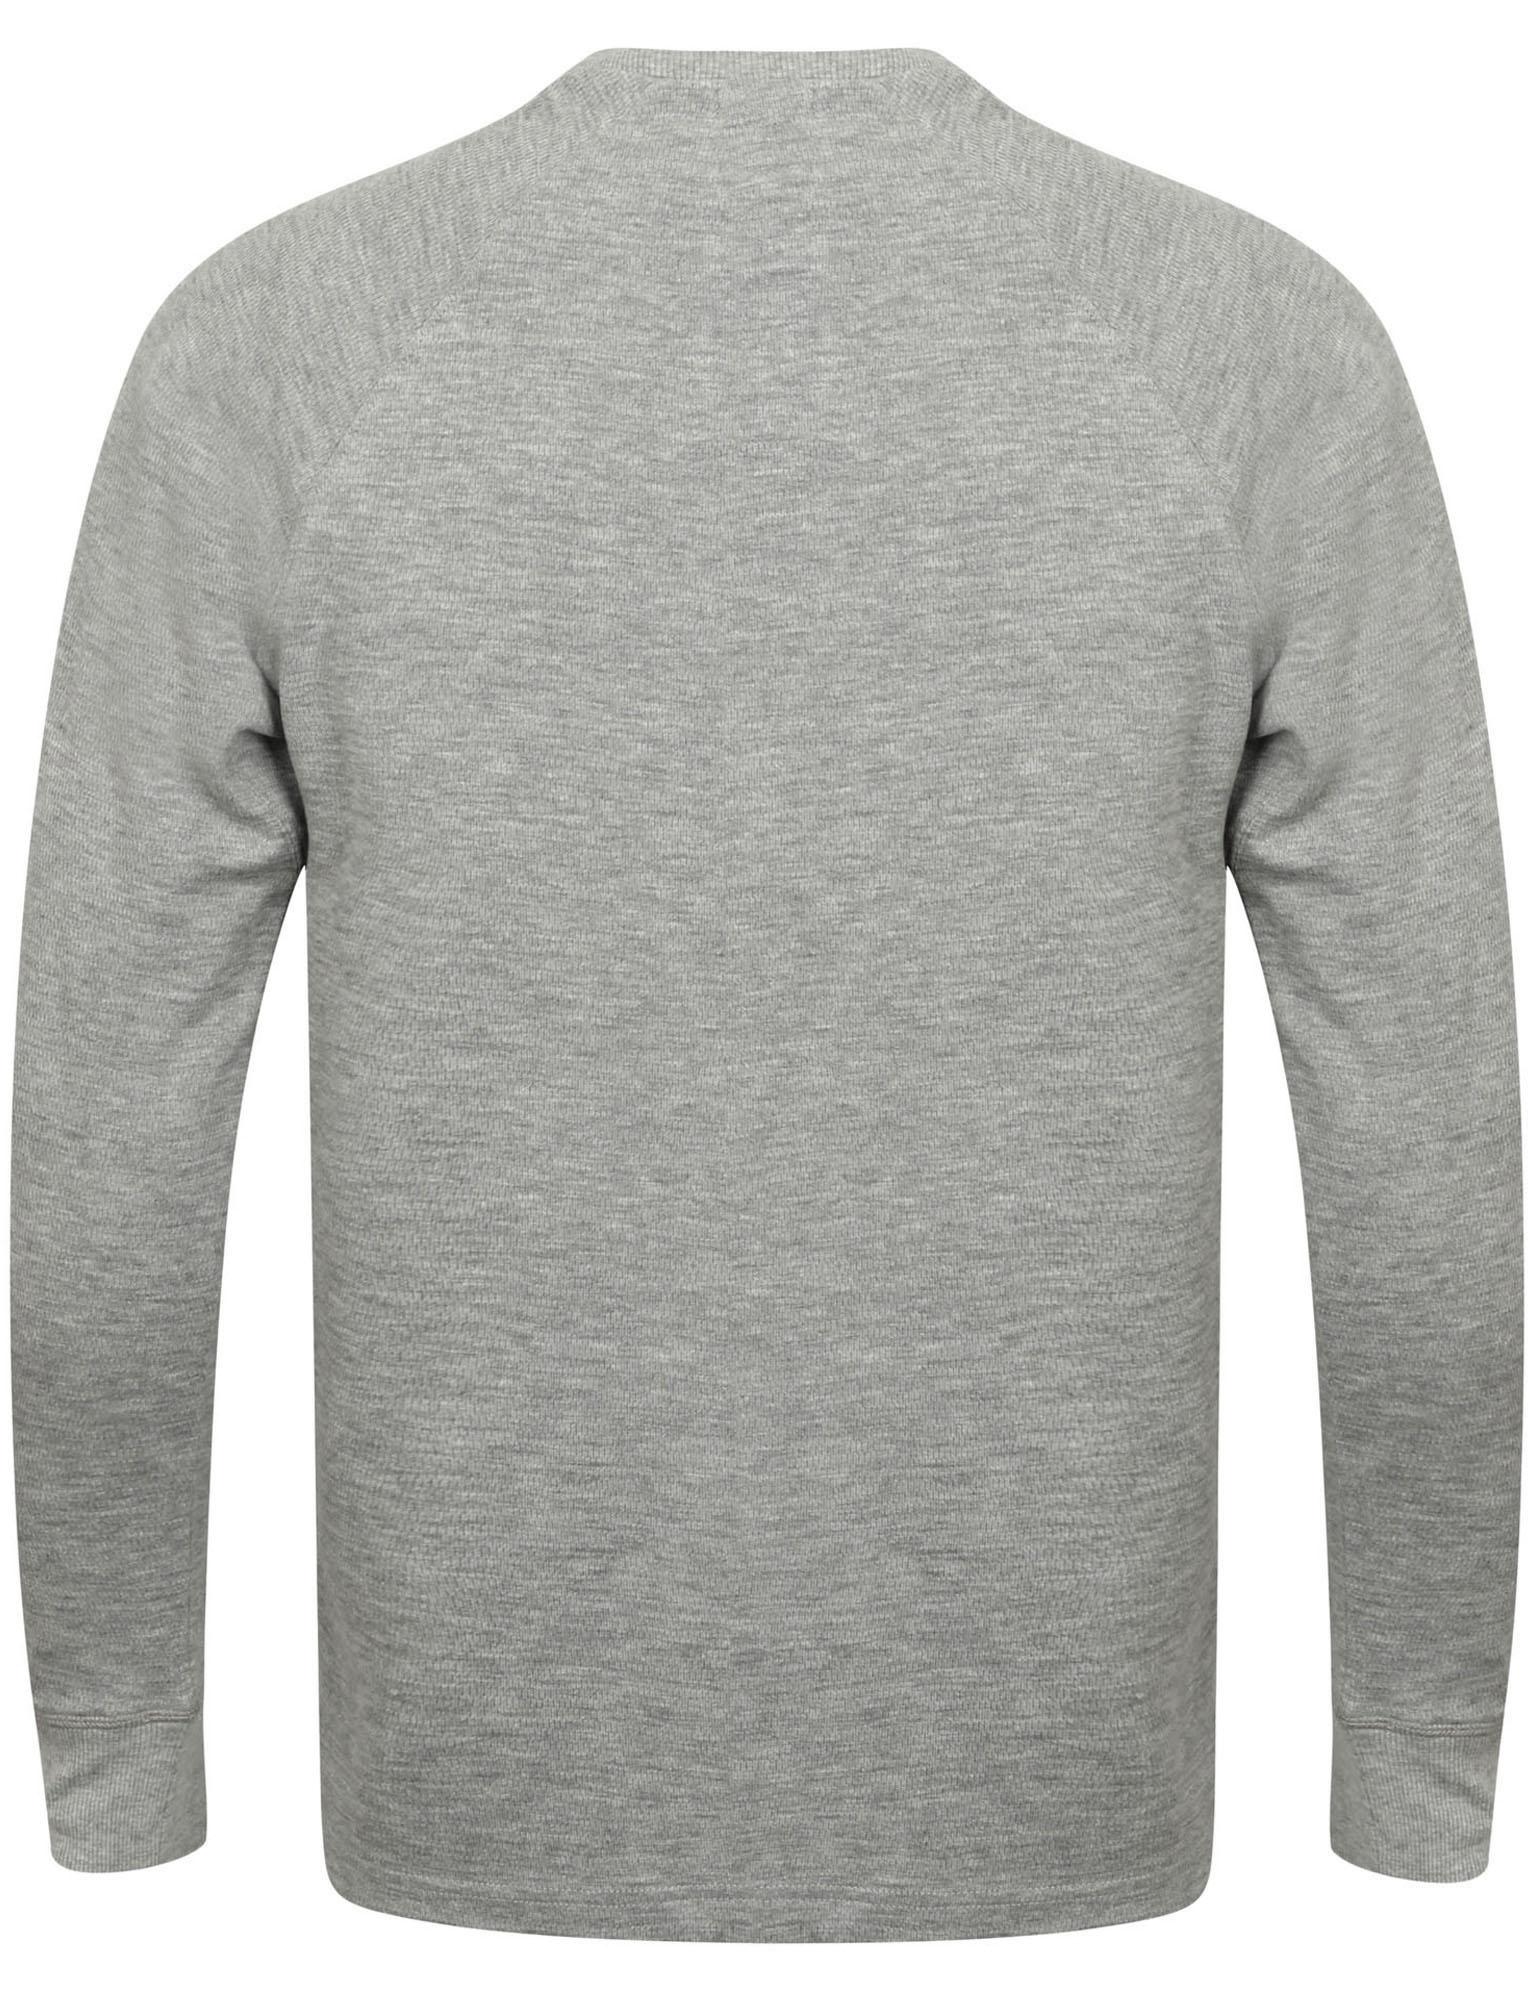 "Da Uomo Top Shirt by Tokyo Laundry /""Dawson Ridge /'a maniche lunghe"